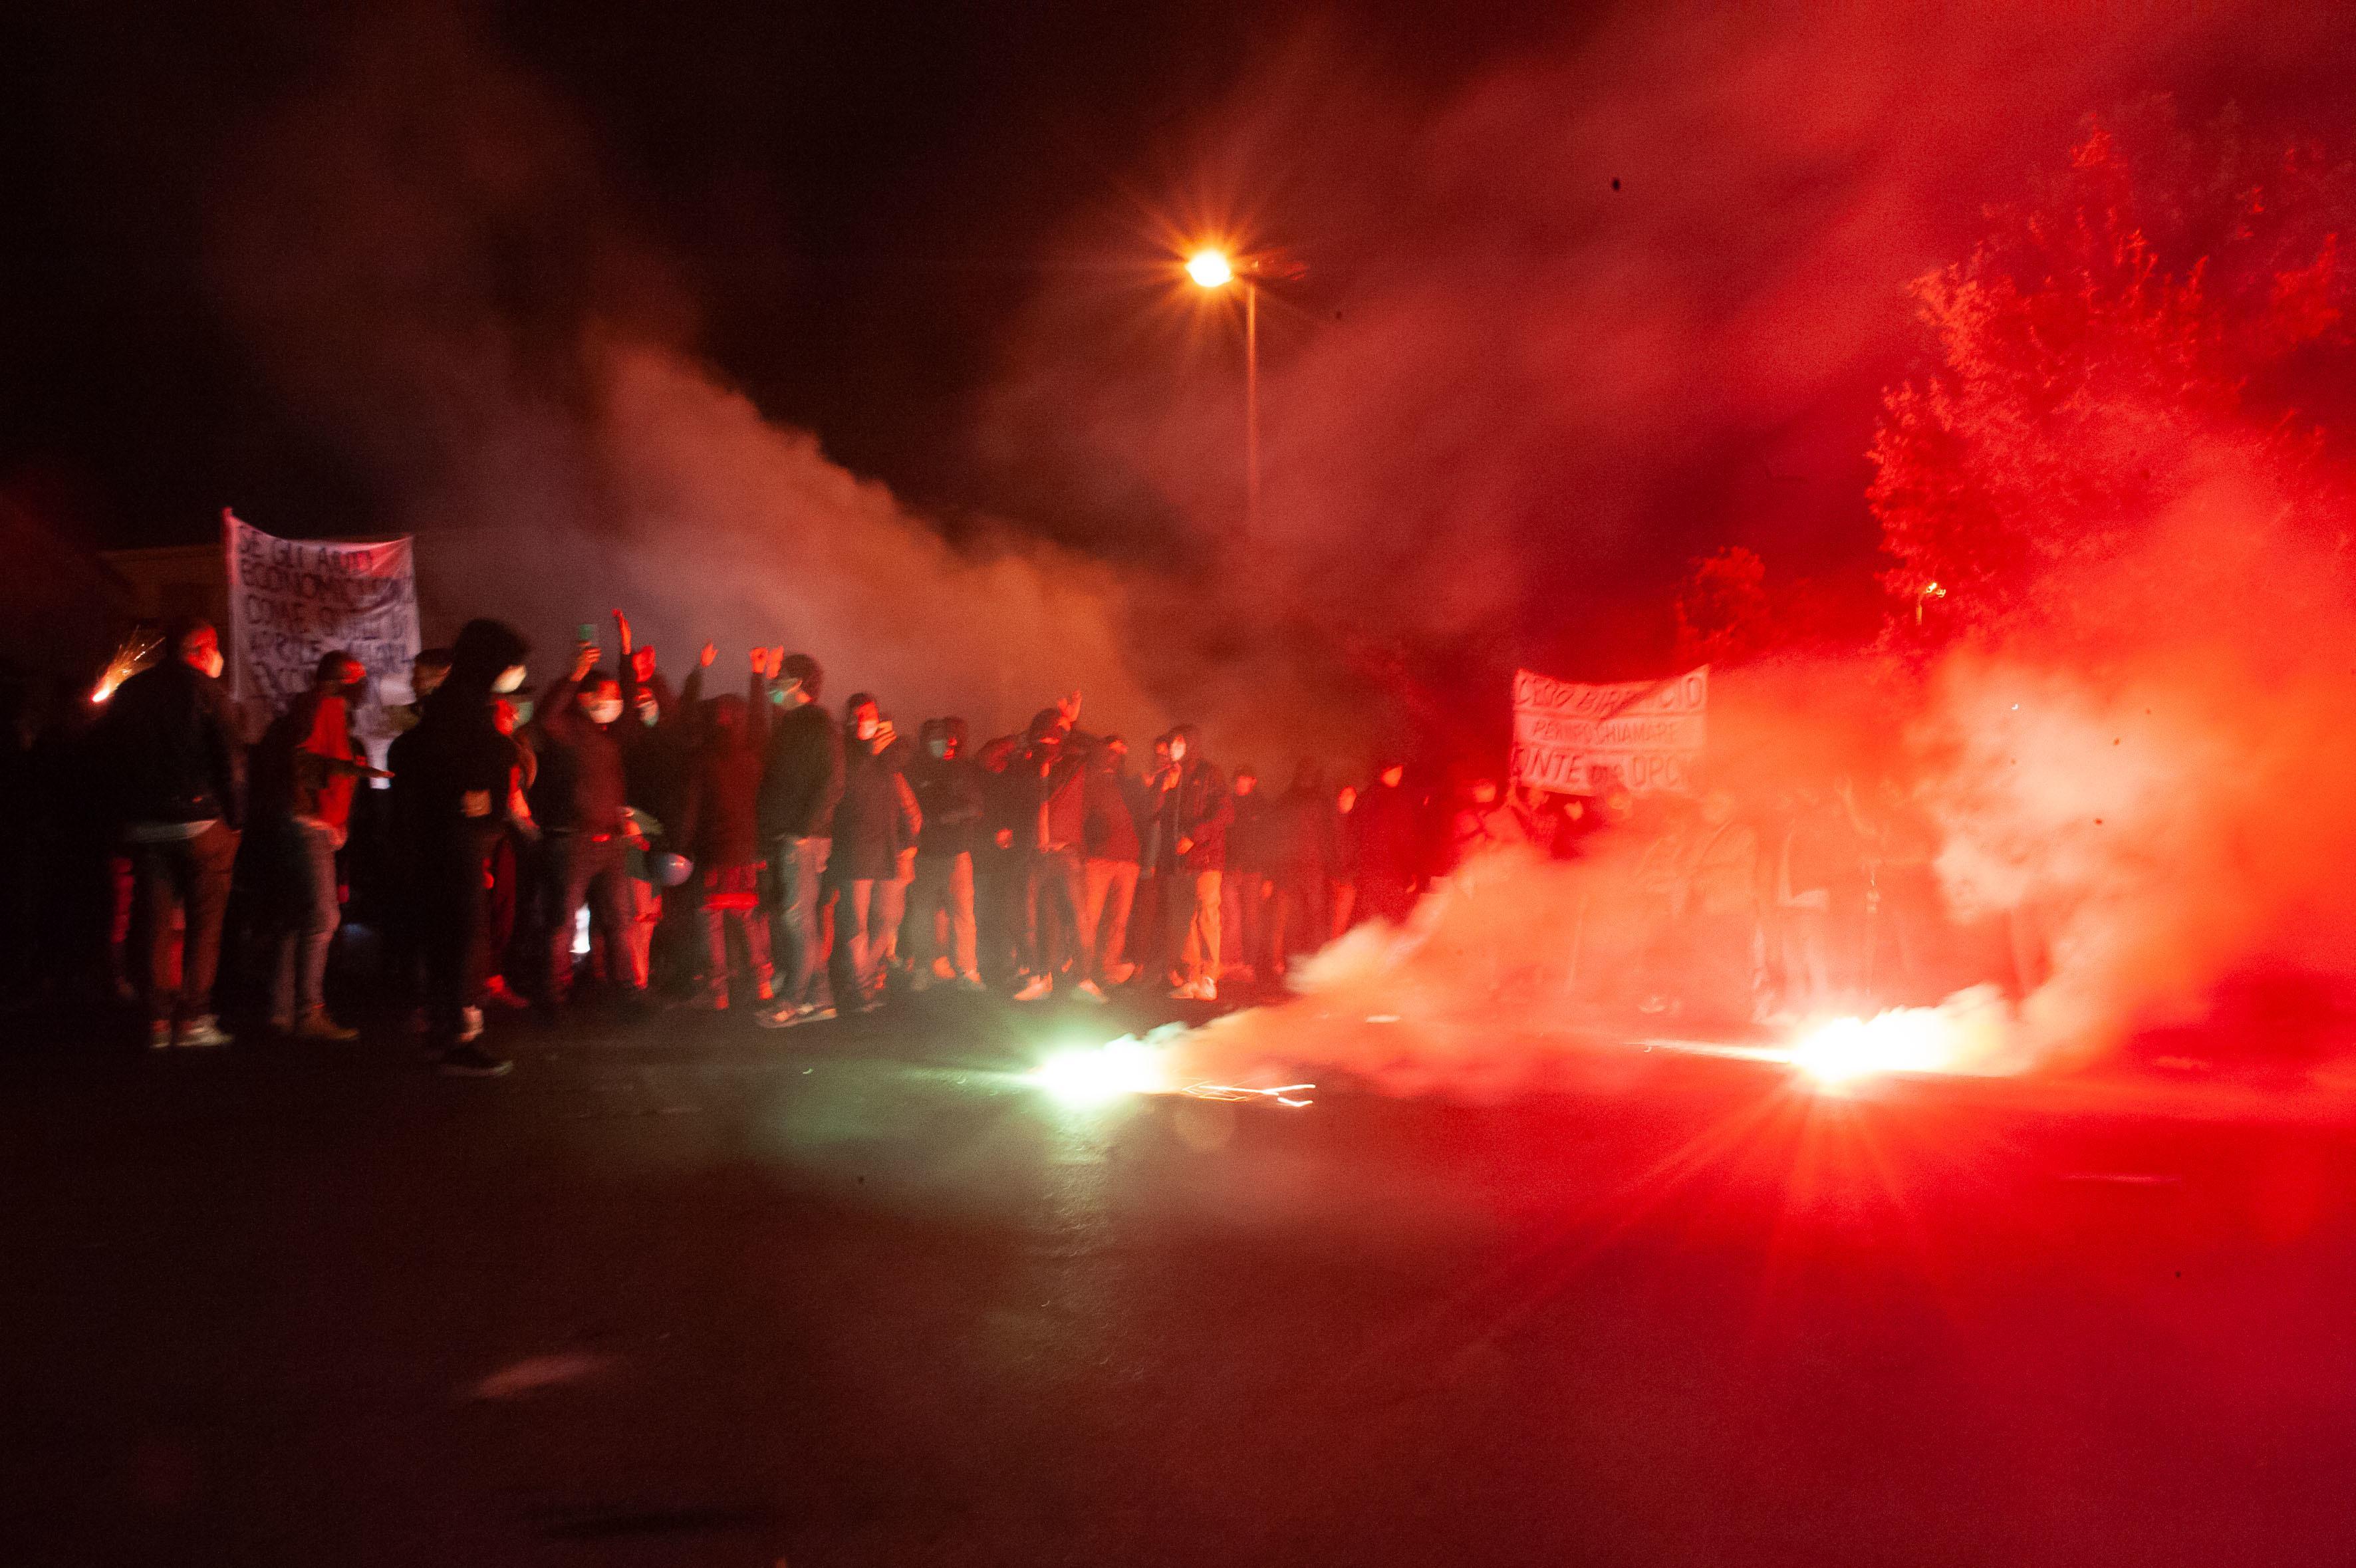 Ausschreitungen in Italien bei Protesten gegen Corona-Maßnahmen | BR24